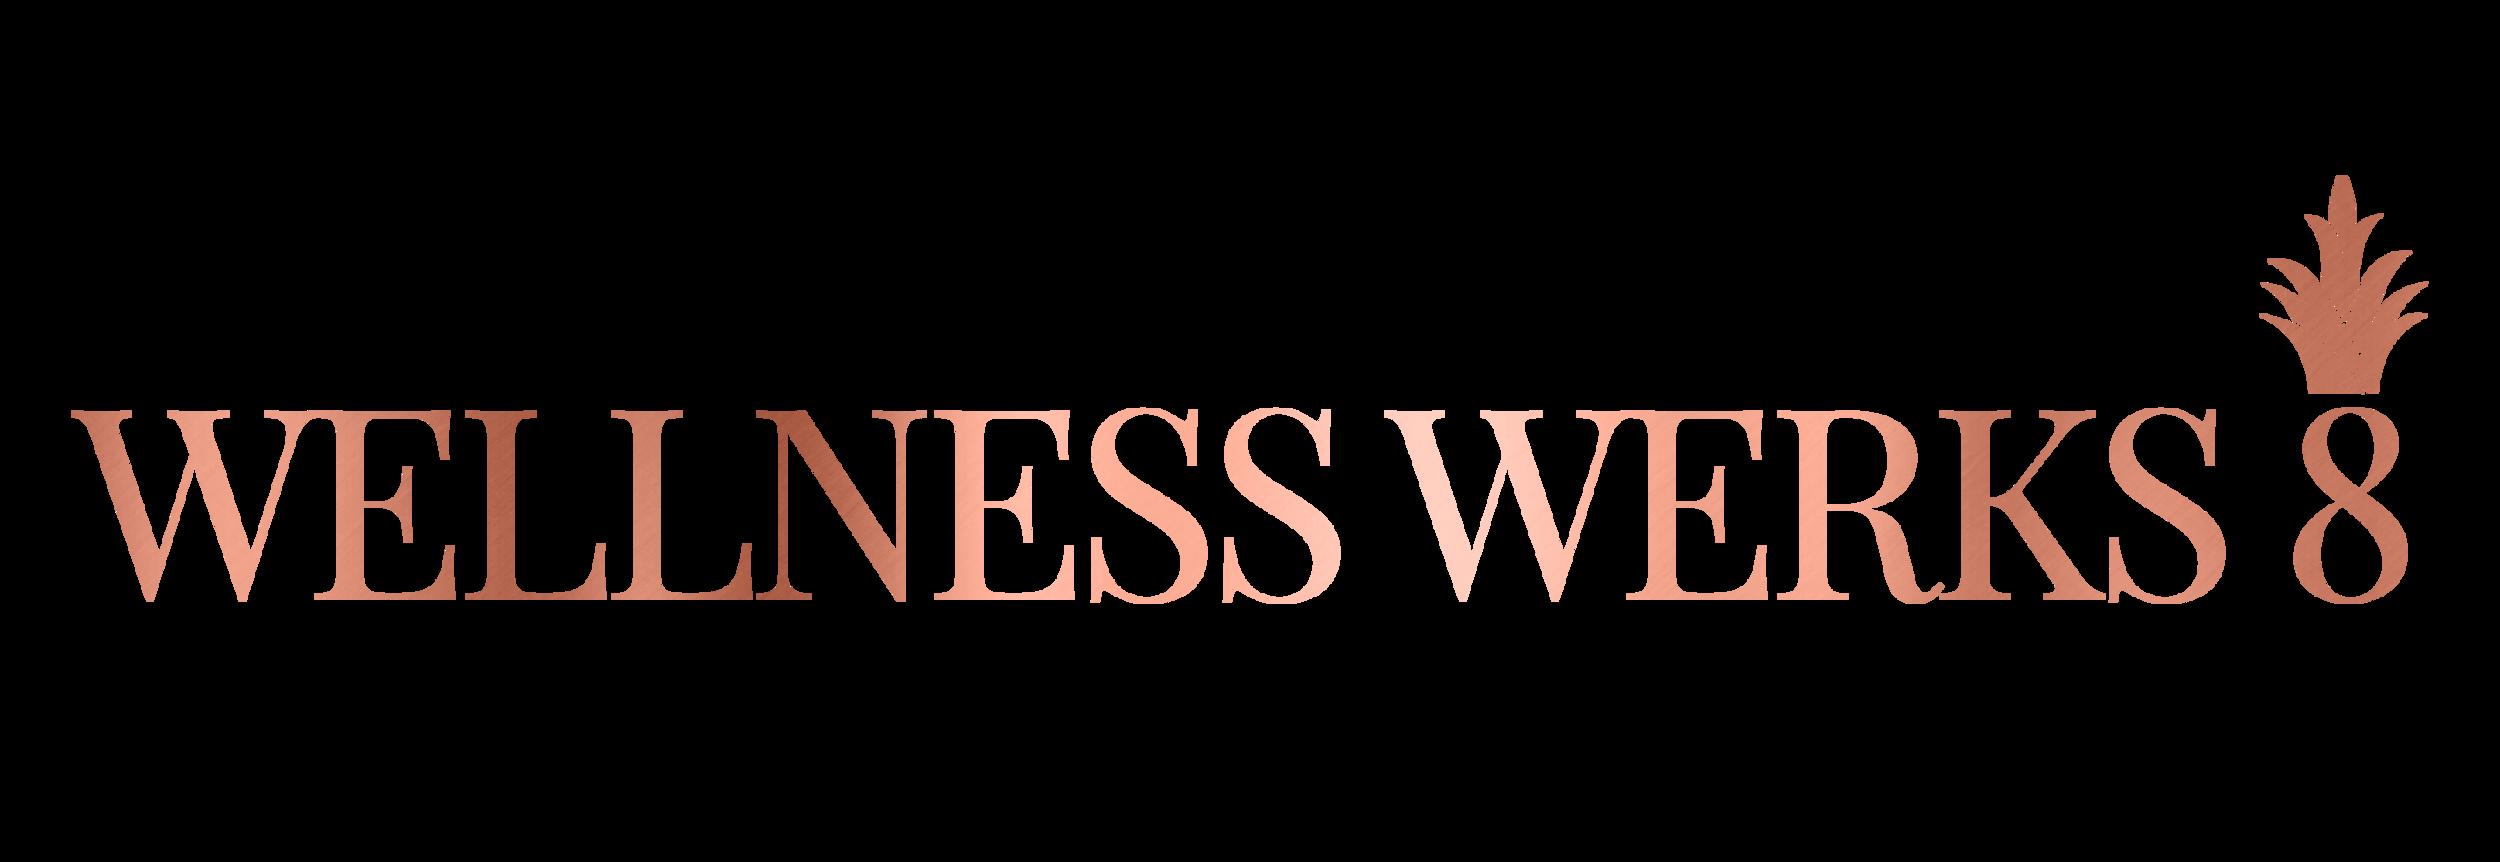 WELLNESSWERKSlogo (1).png